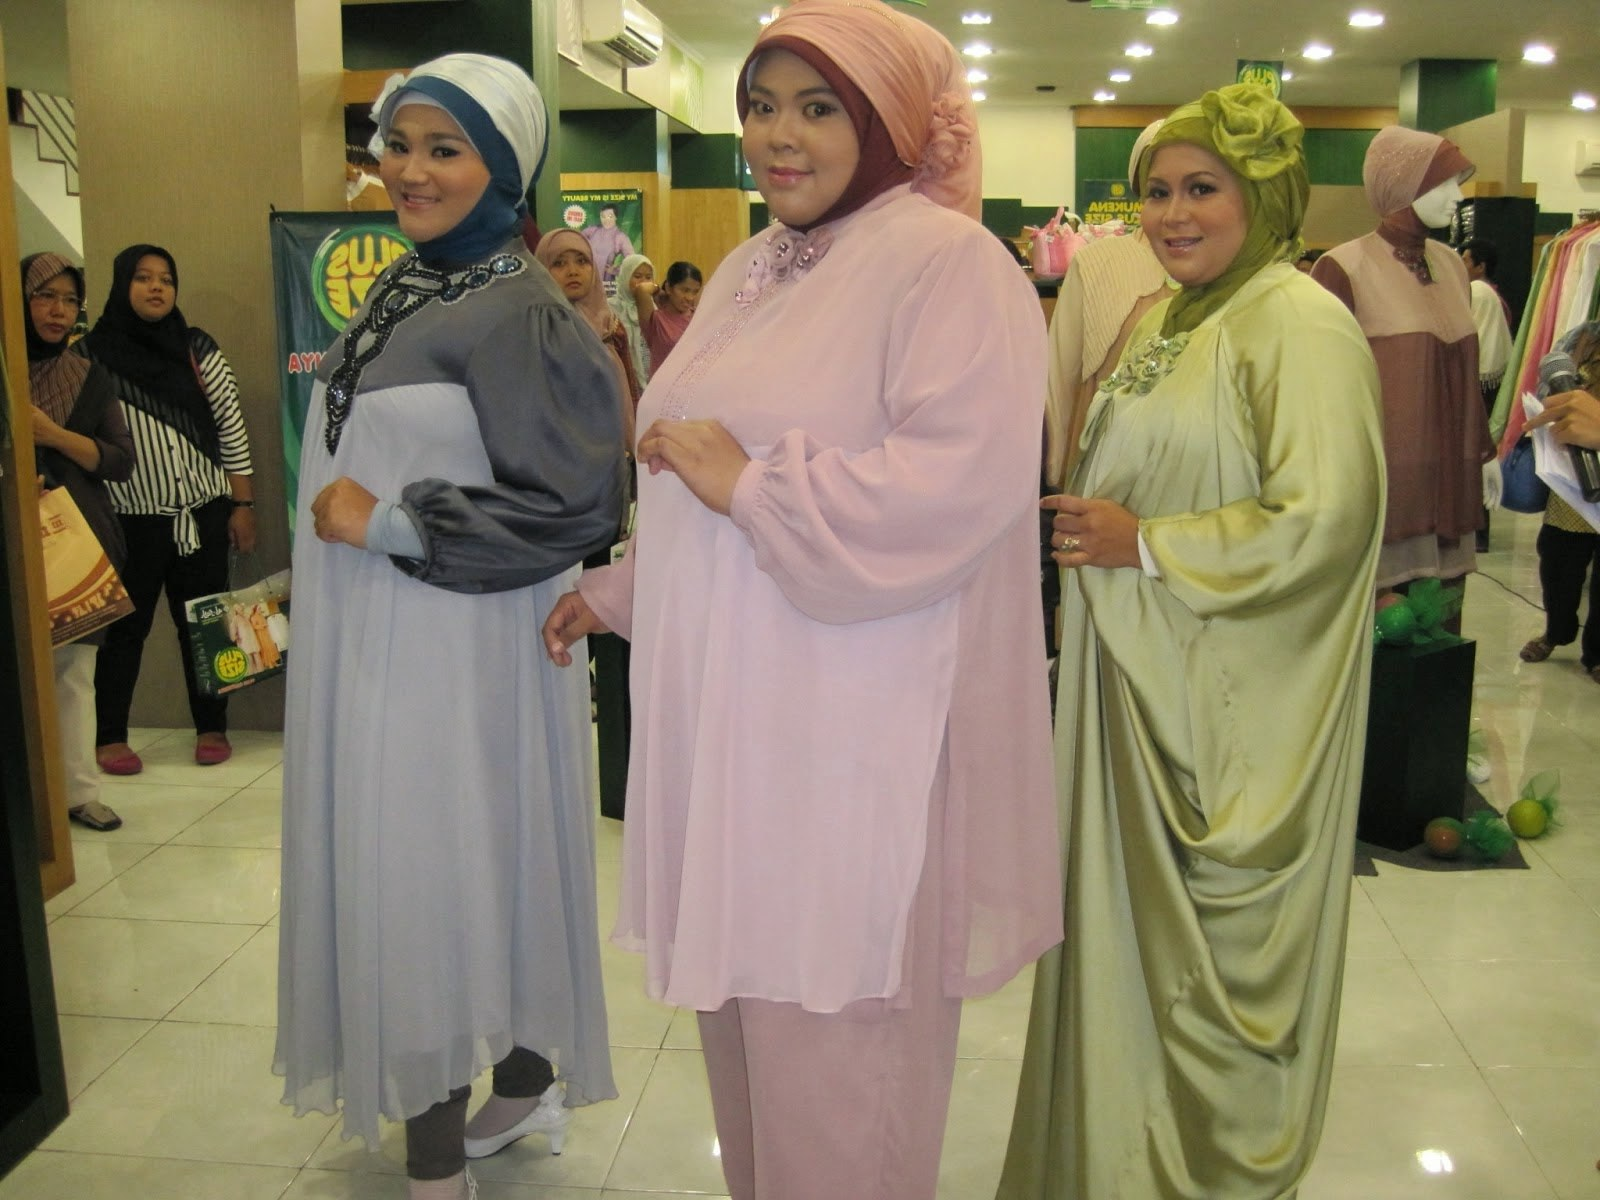 Bentuk Baju Lebaran Untuk Ibu Gemuk U3dh Model Baju Lebaran Untuk Wanita Gemuk